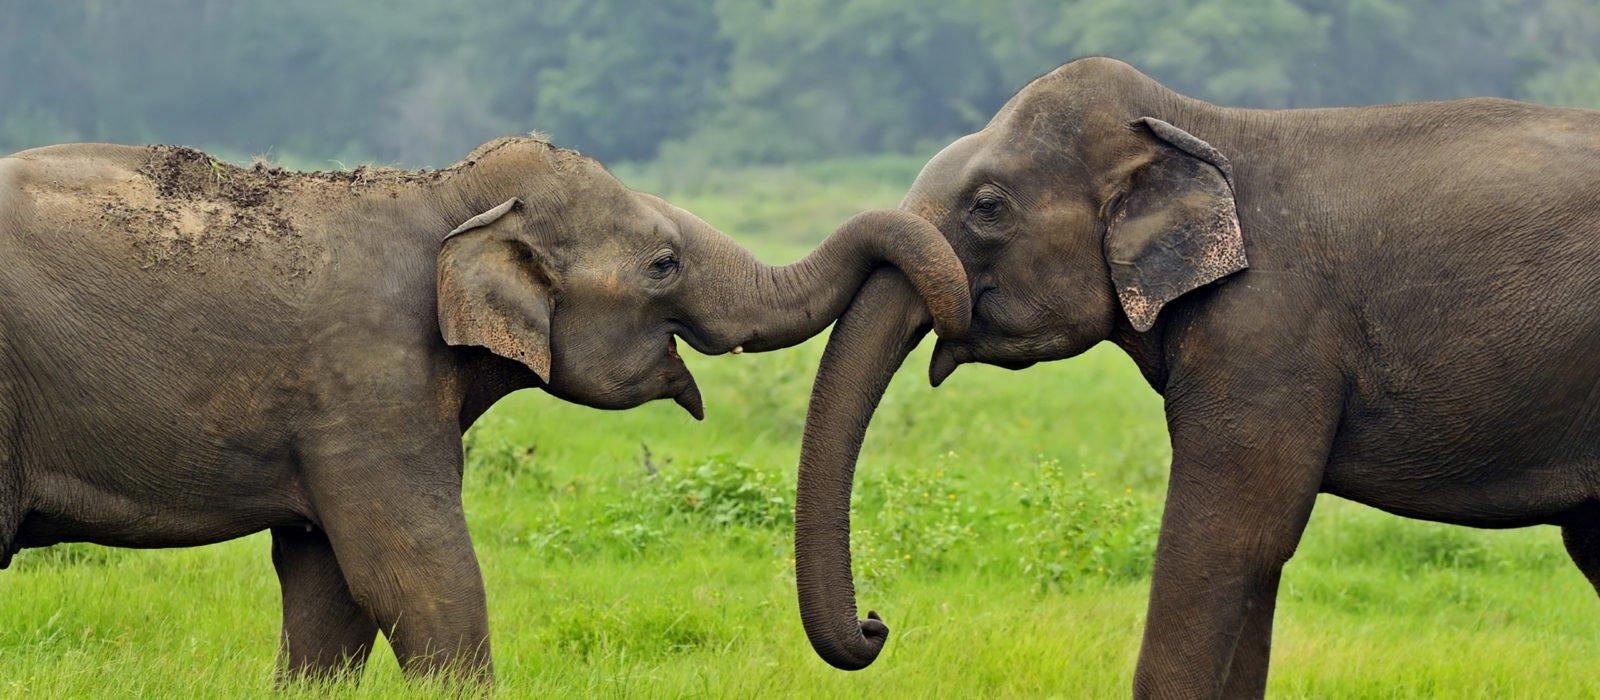 elephants-wild-sri-lanka